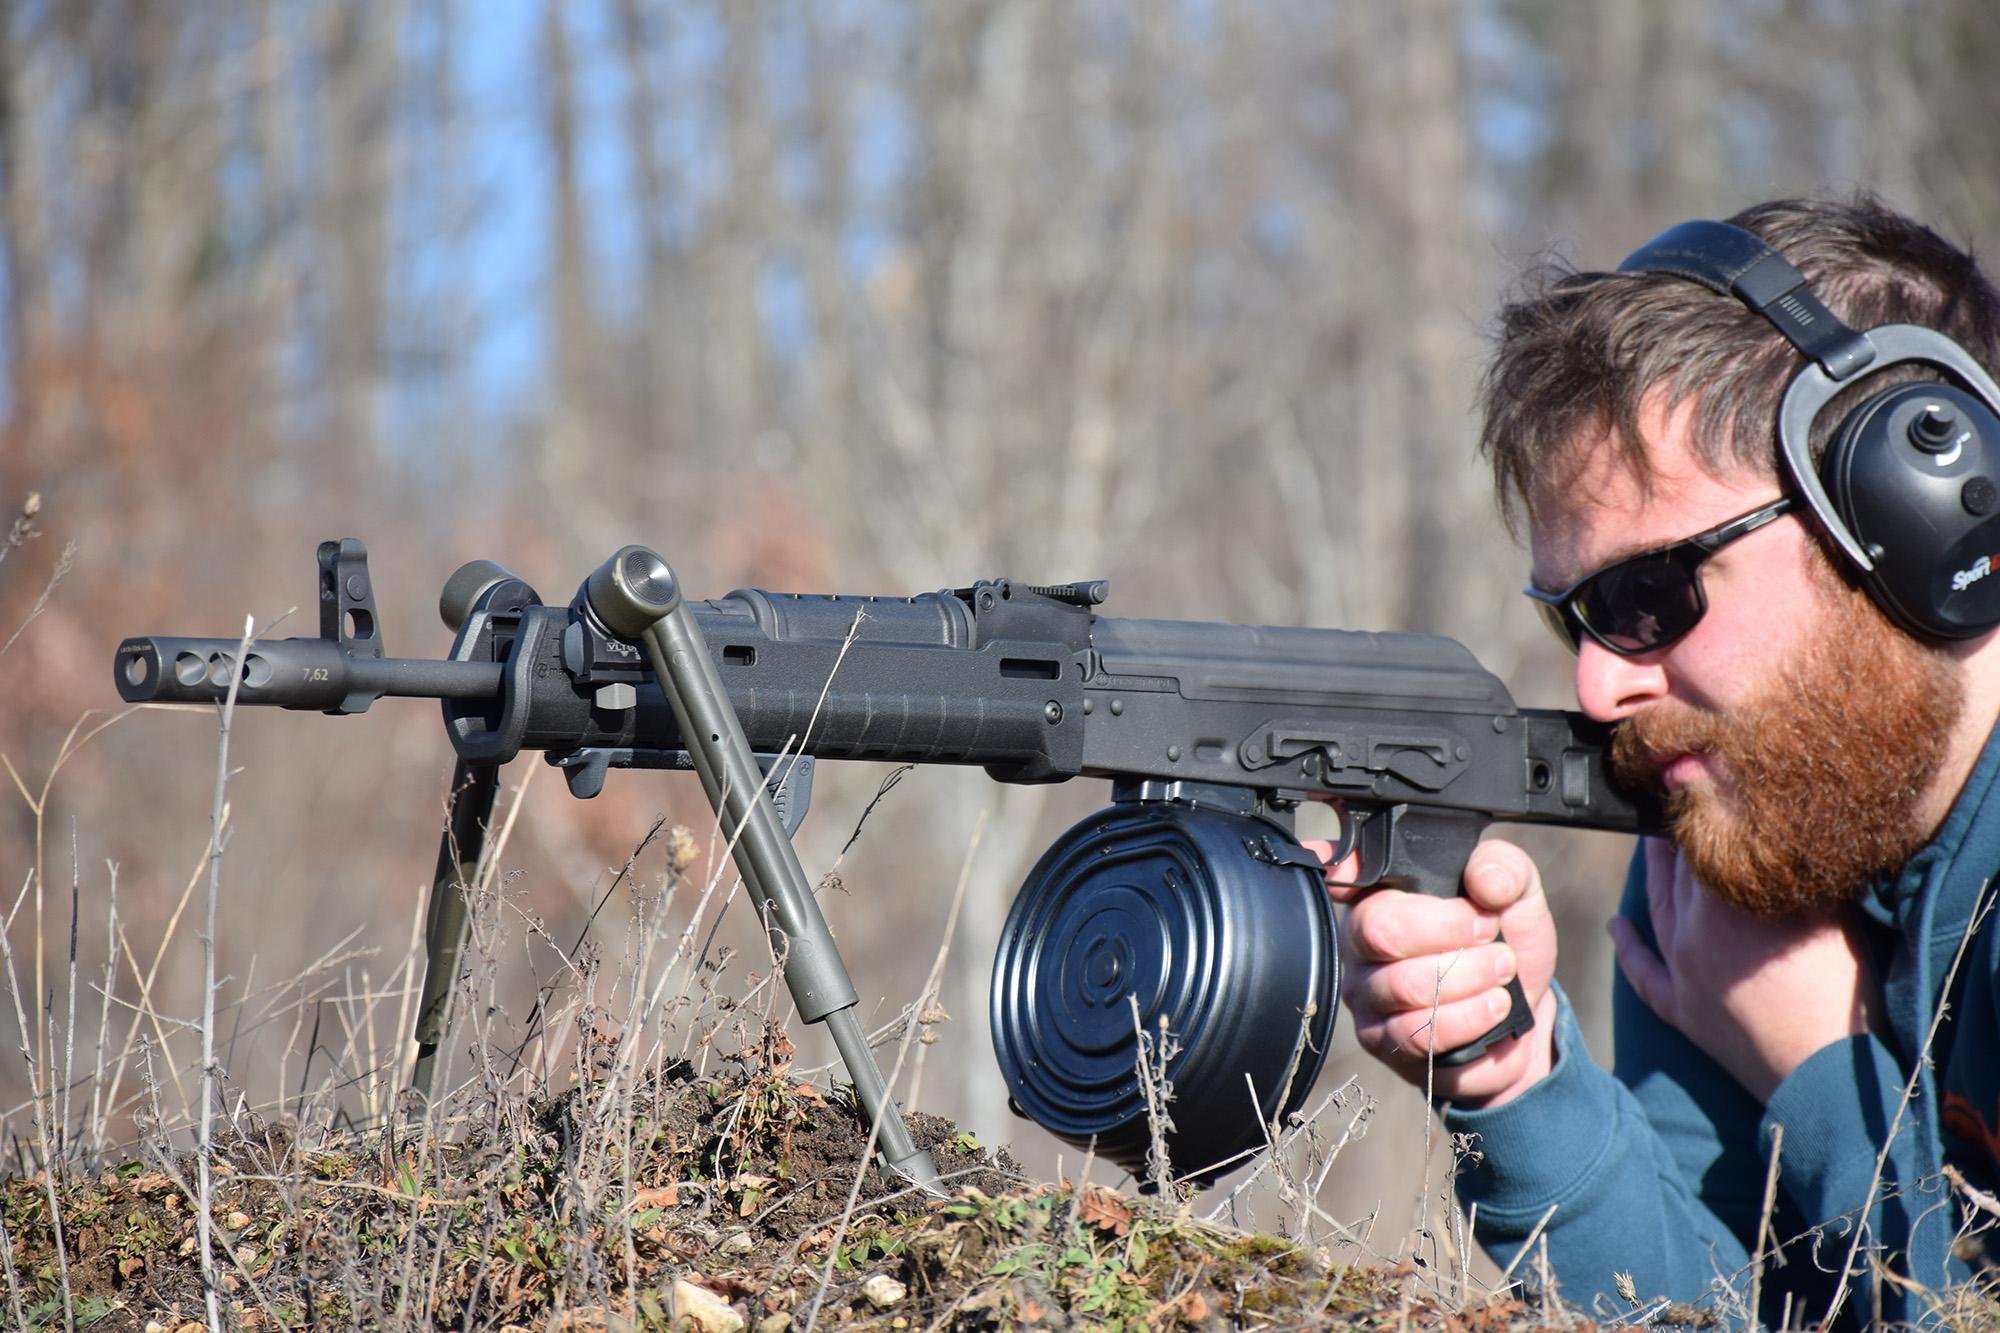 Review: Magpul Zhukov AK Stock and Handguard - OutdoorHub